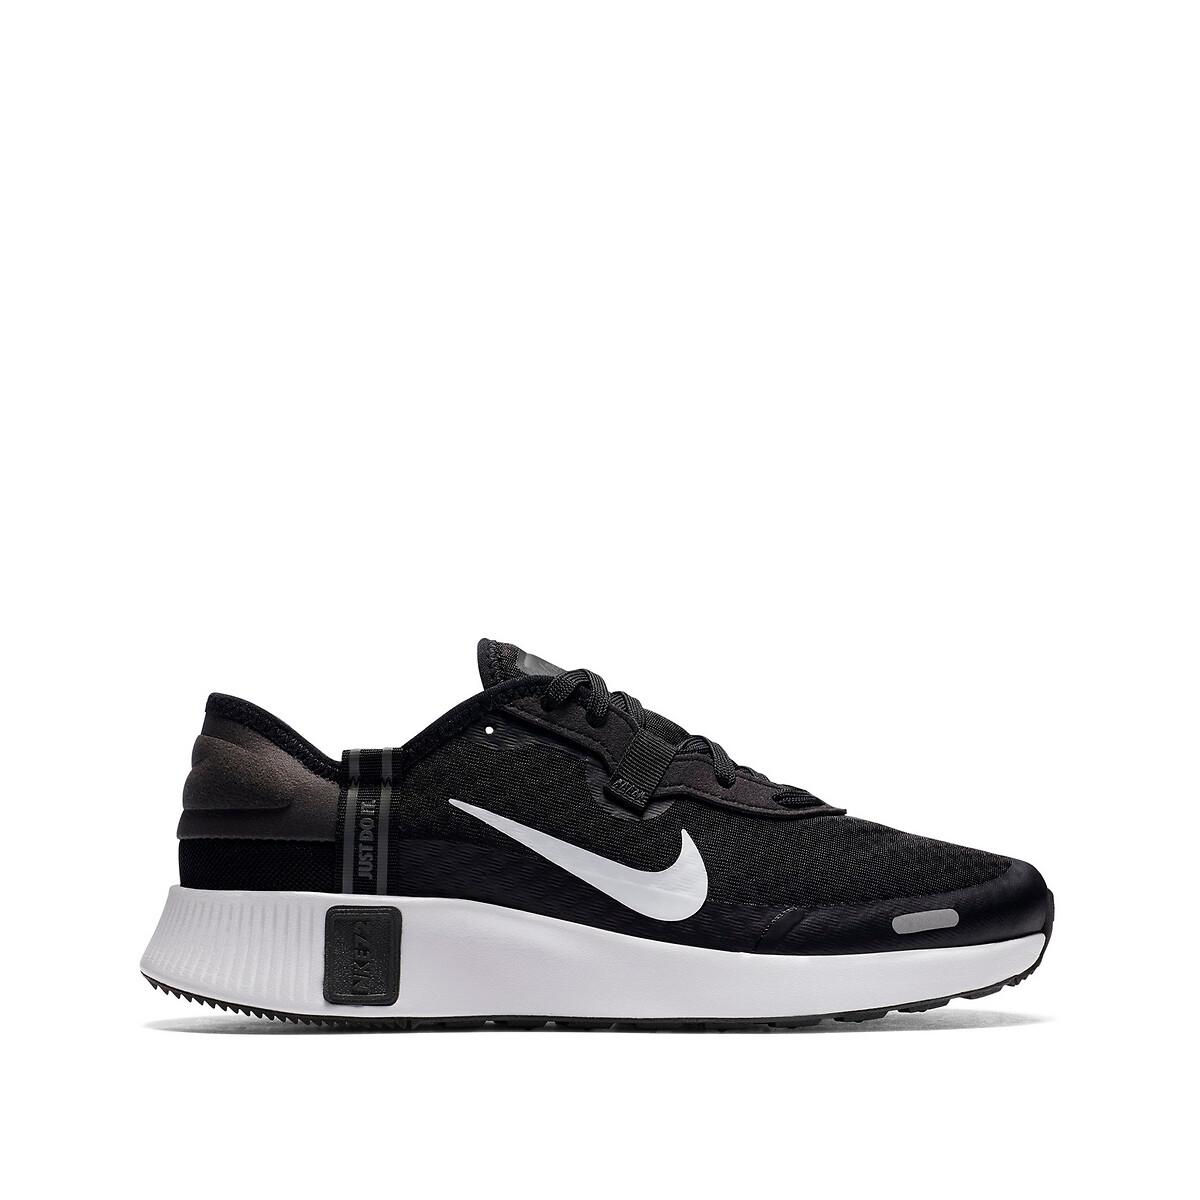 Nike Reposto Junior Black/Dark Smoke Grey/Iron Grey/White Kind online kopen